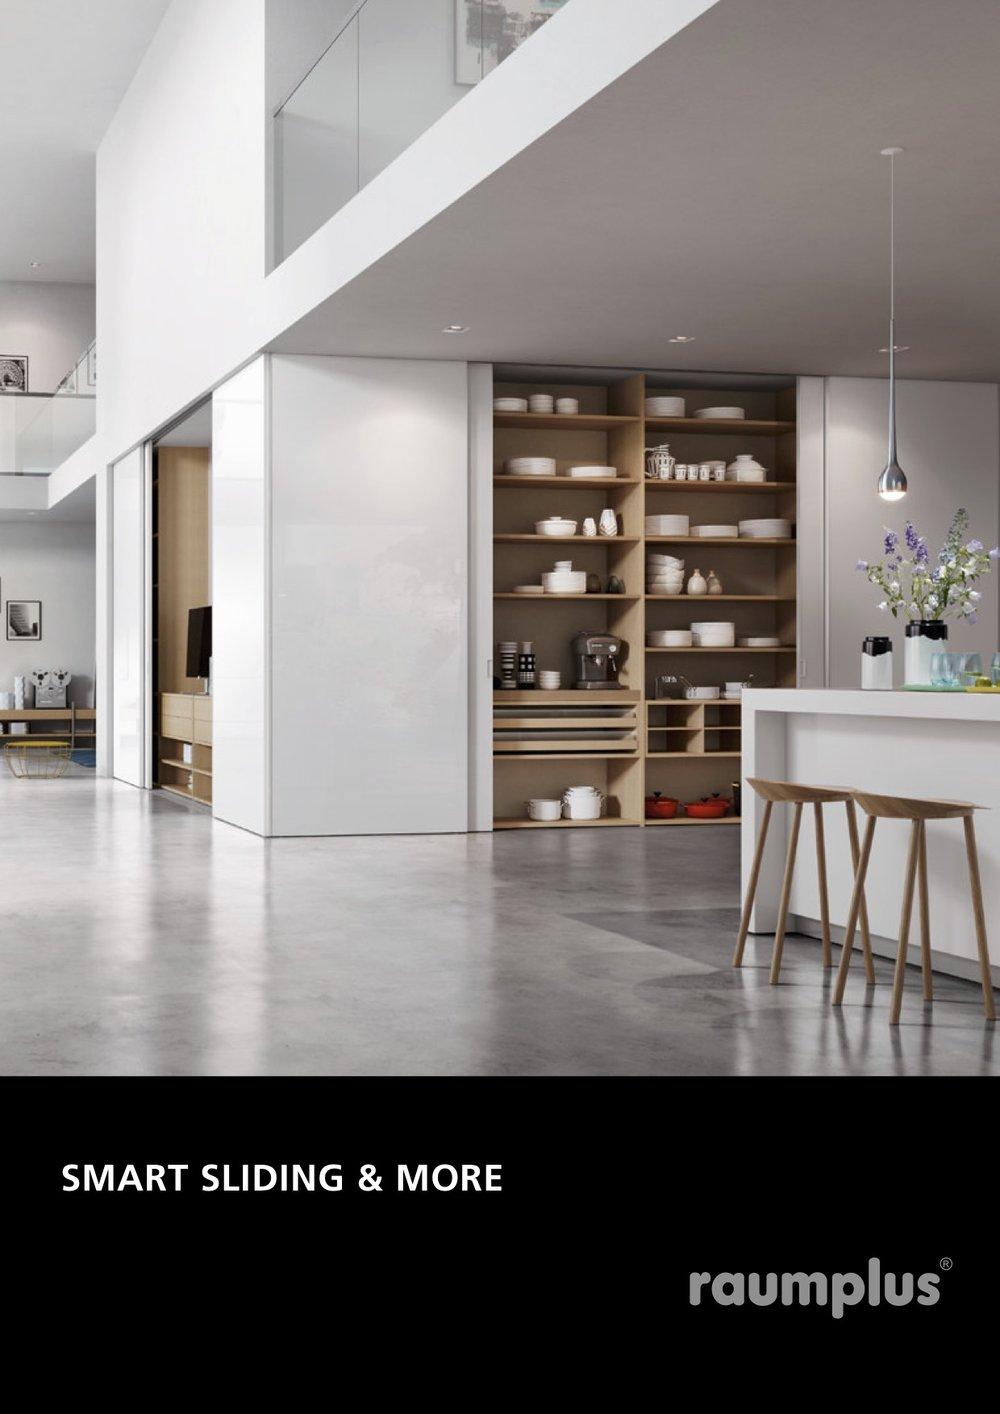 OllyBulgaria_Raumplus_SmartSliding&More.jpg